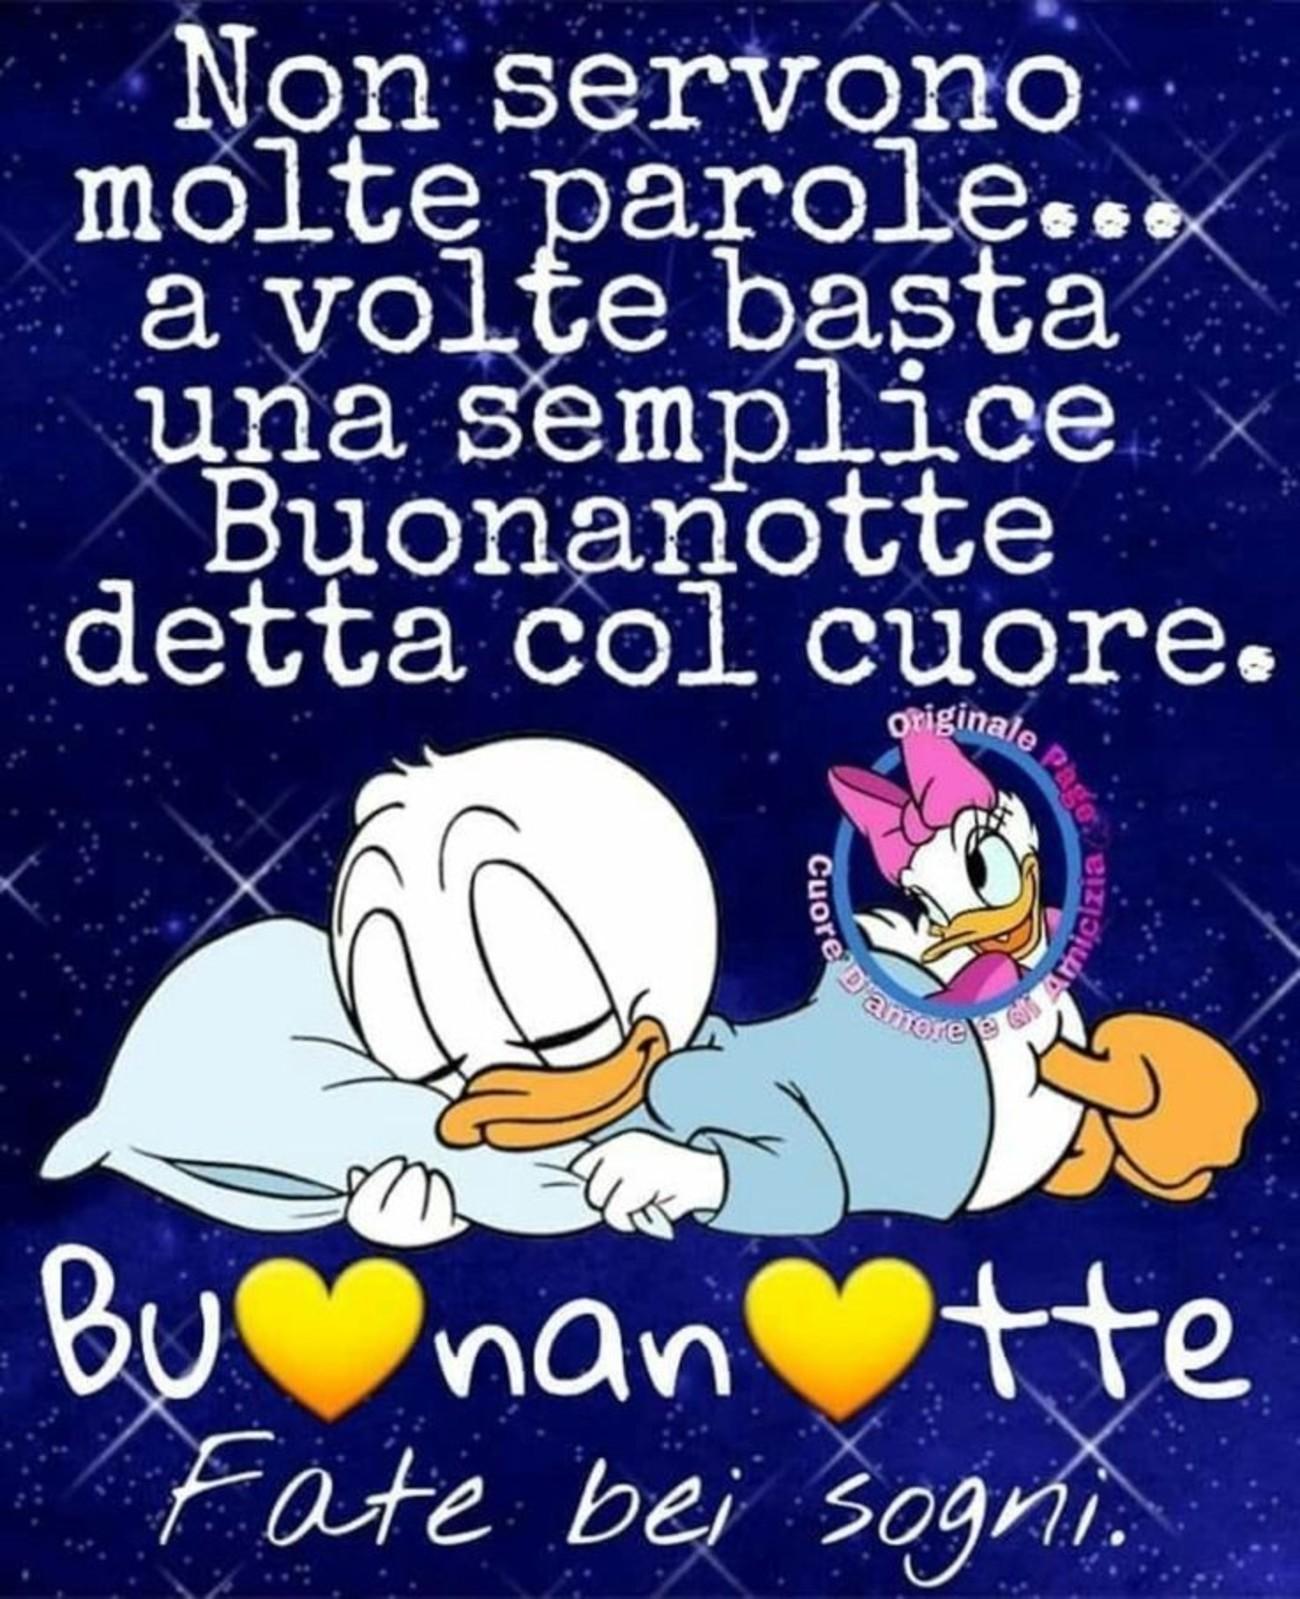 Buonanotte Belle Frasi 5 Buongiornoate It